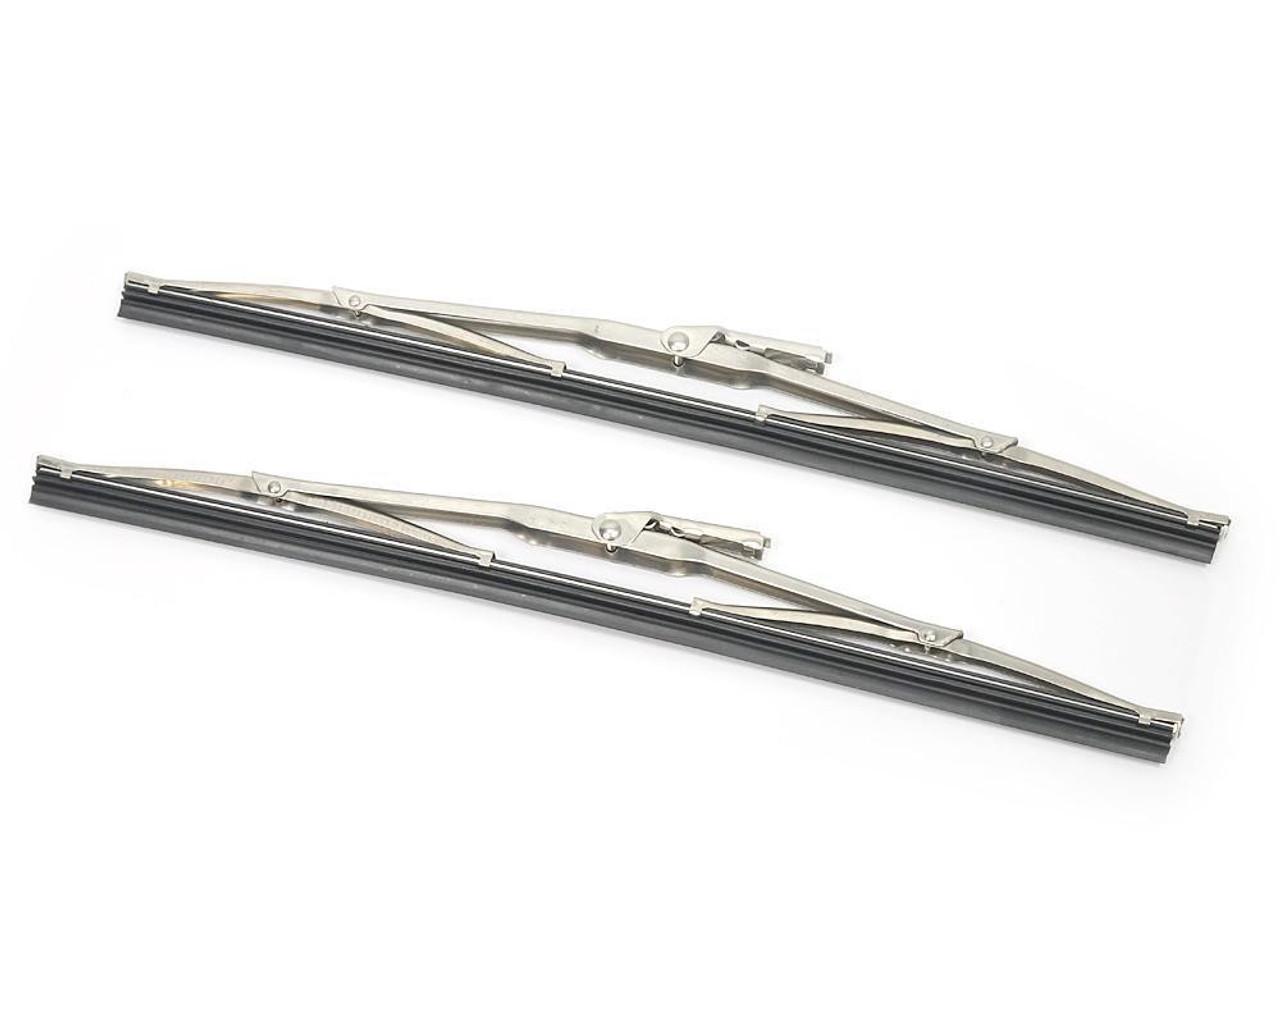 Stainless Steel 13 Inch Wiper Blade Set - 1966-78